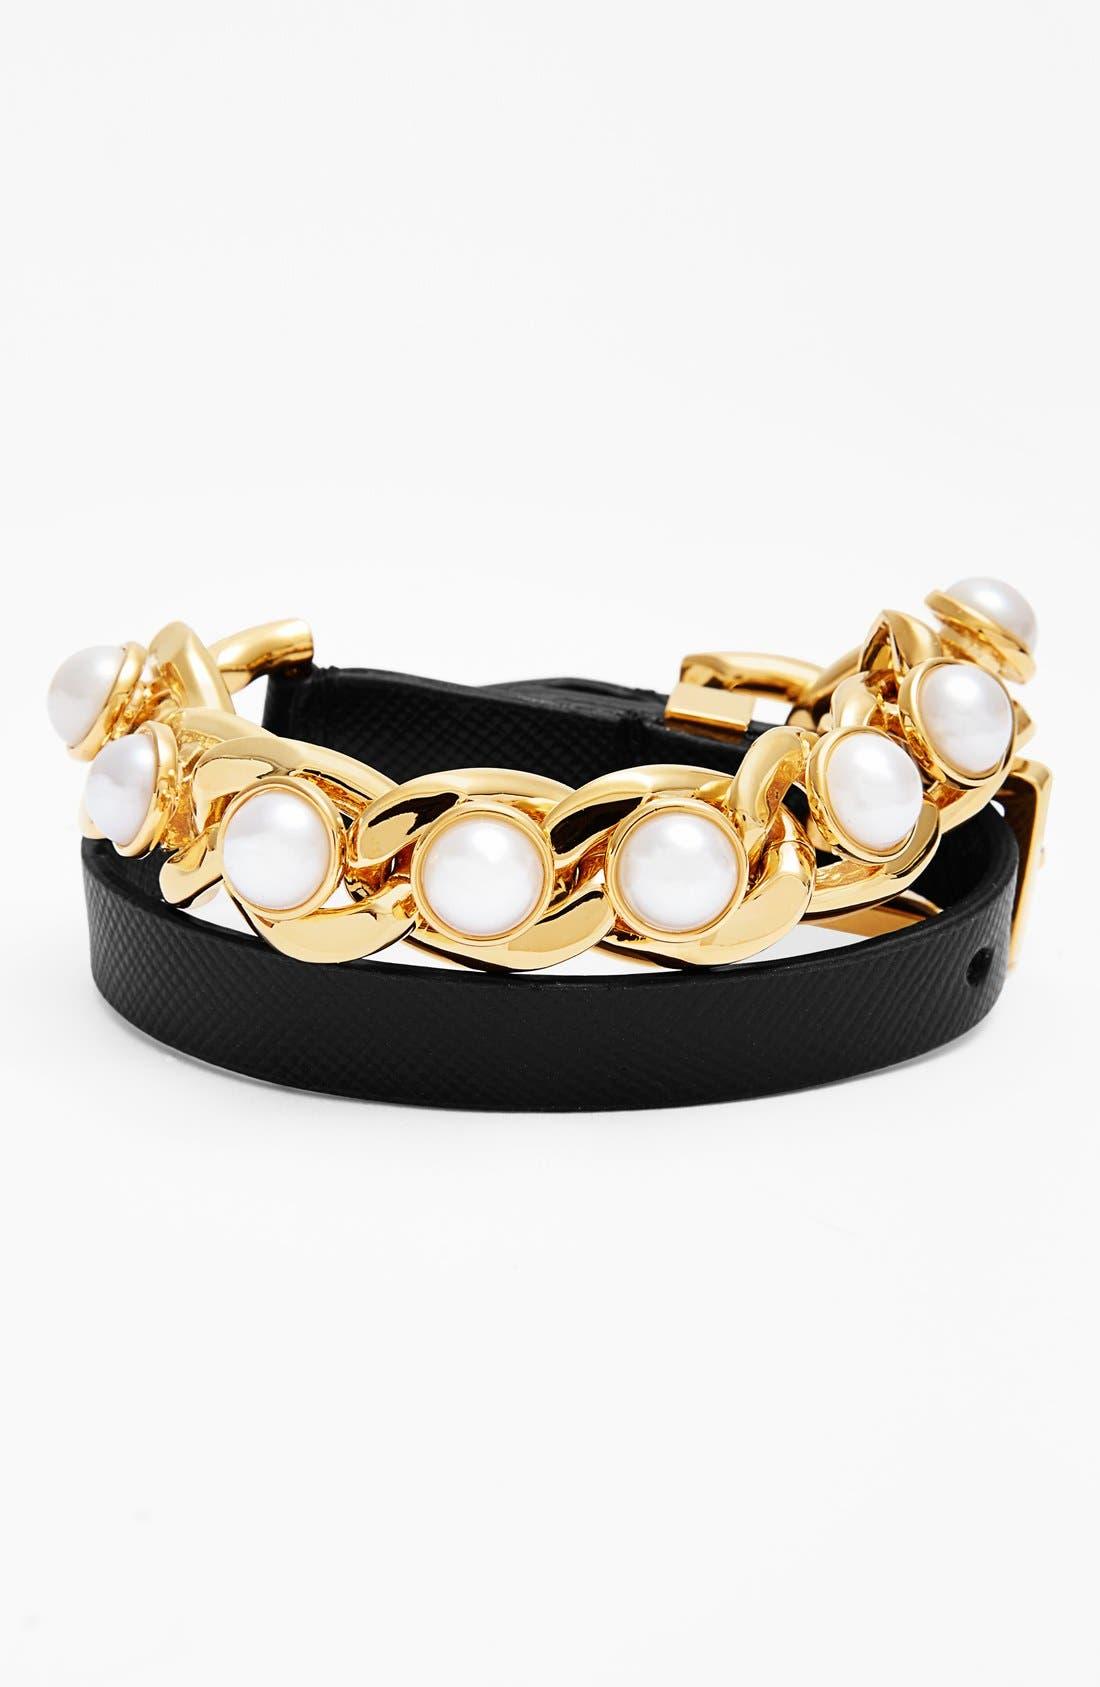 TORY BURCH 'Winchel' Leather & Chain Double Wrap Bracelet, Main, color, 001